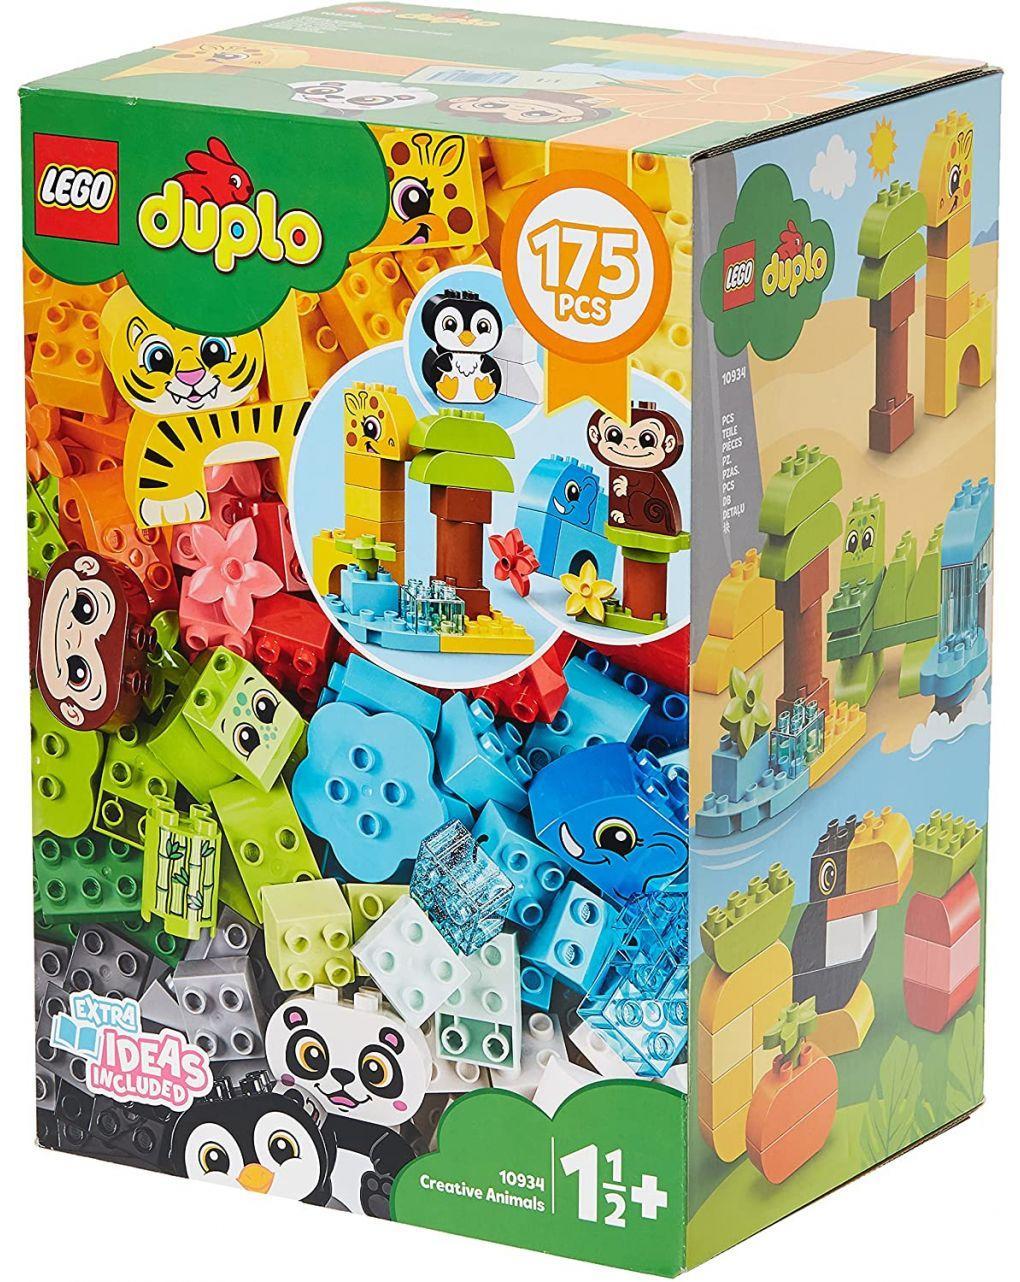 Lego duplo animali creativi - 10934 - LEGO Duplo